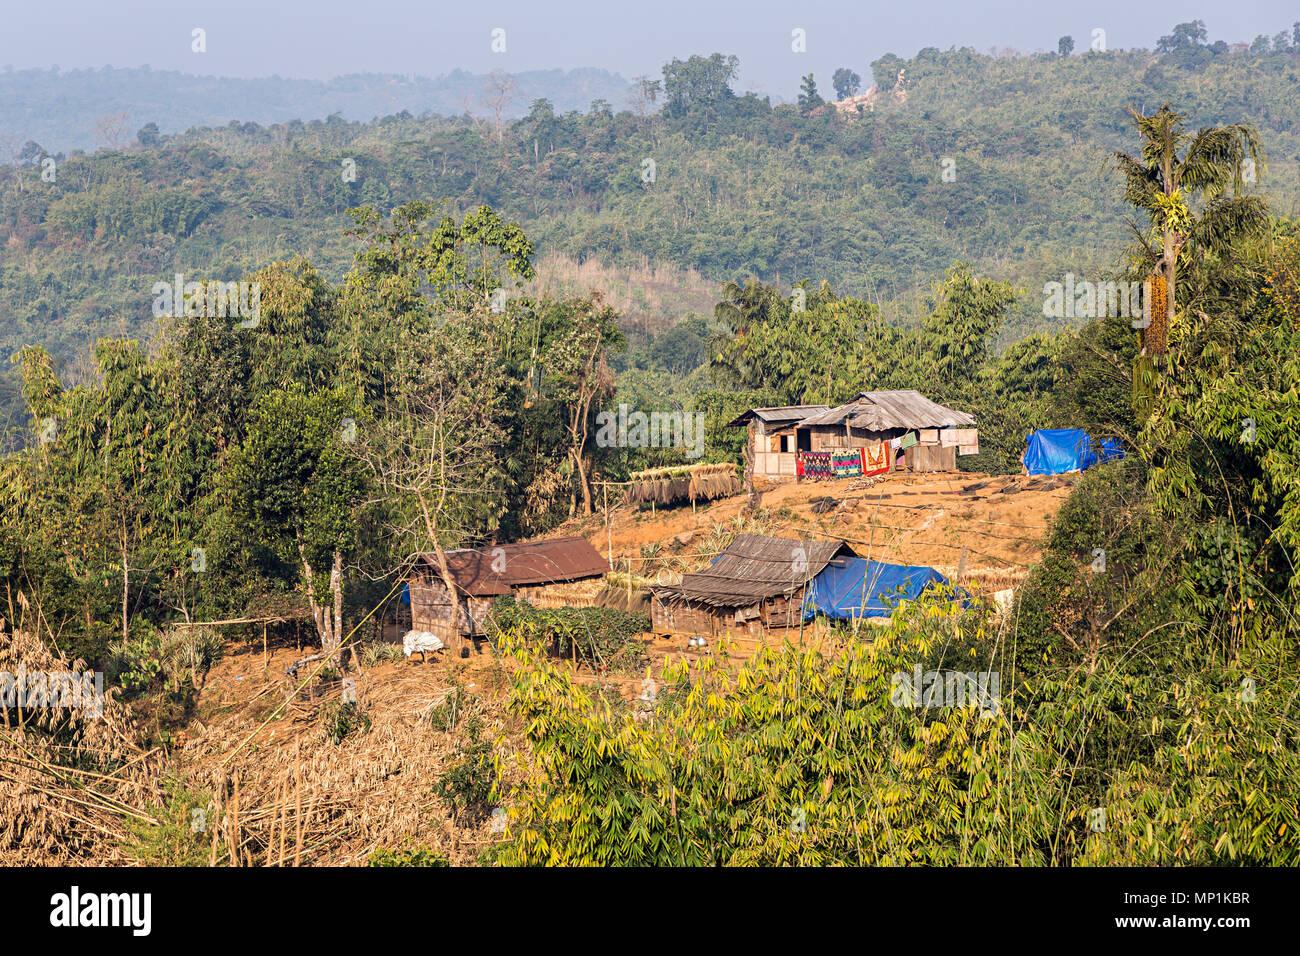 Haus in саква Dorf, Meghalaya, Indien Stockfoto